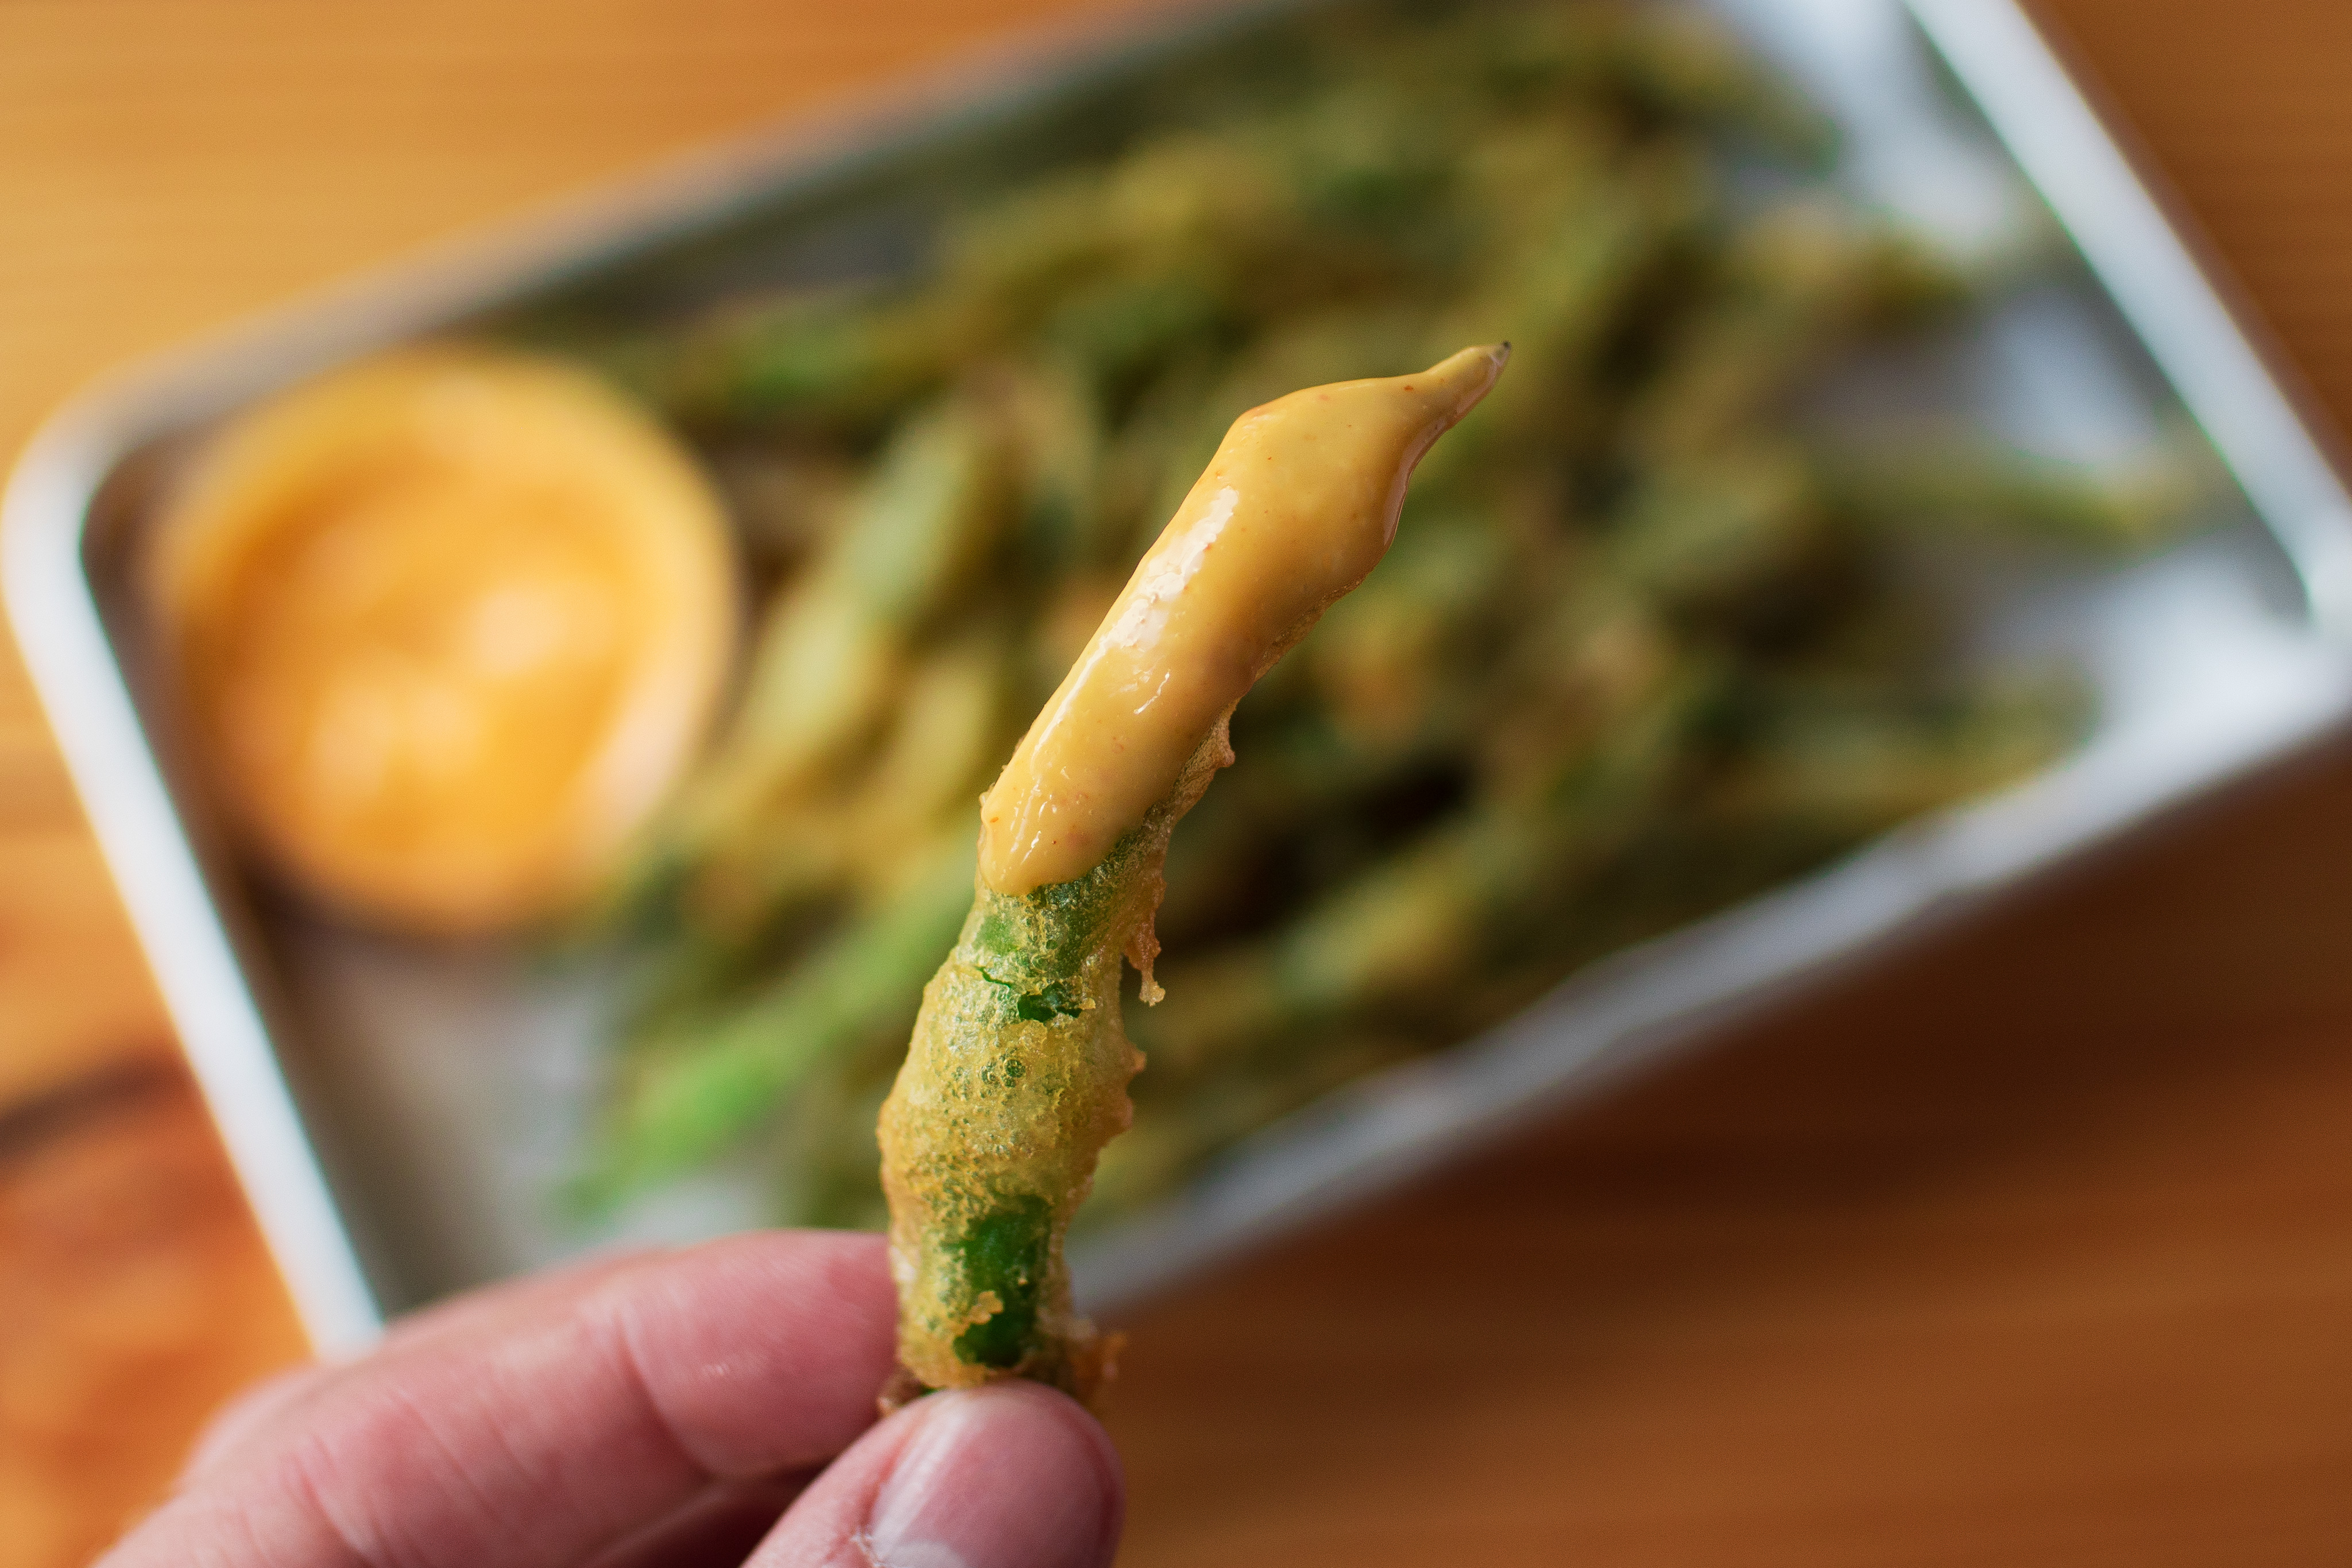 feed-co-burgers-_-tempura-veggies